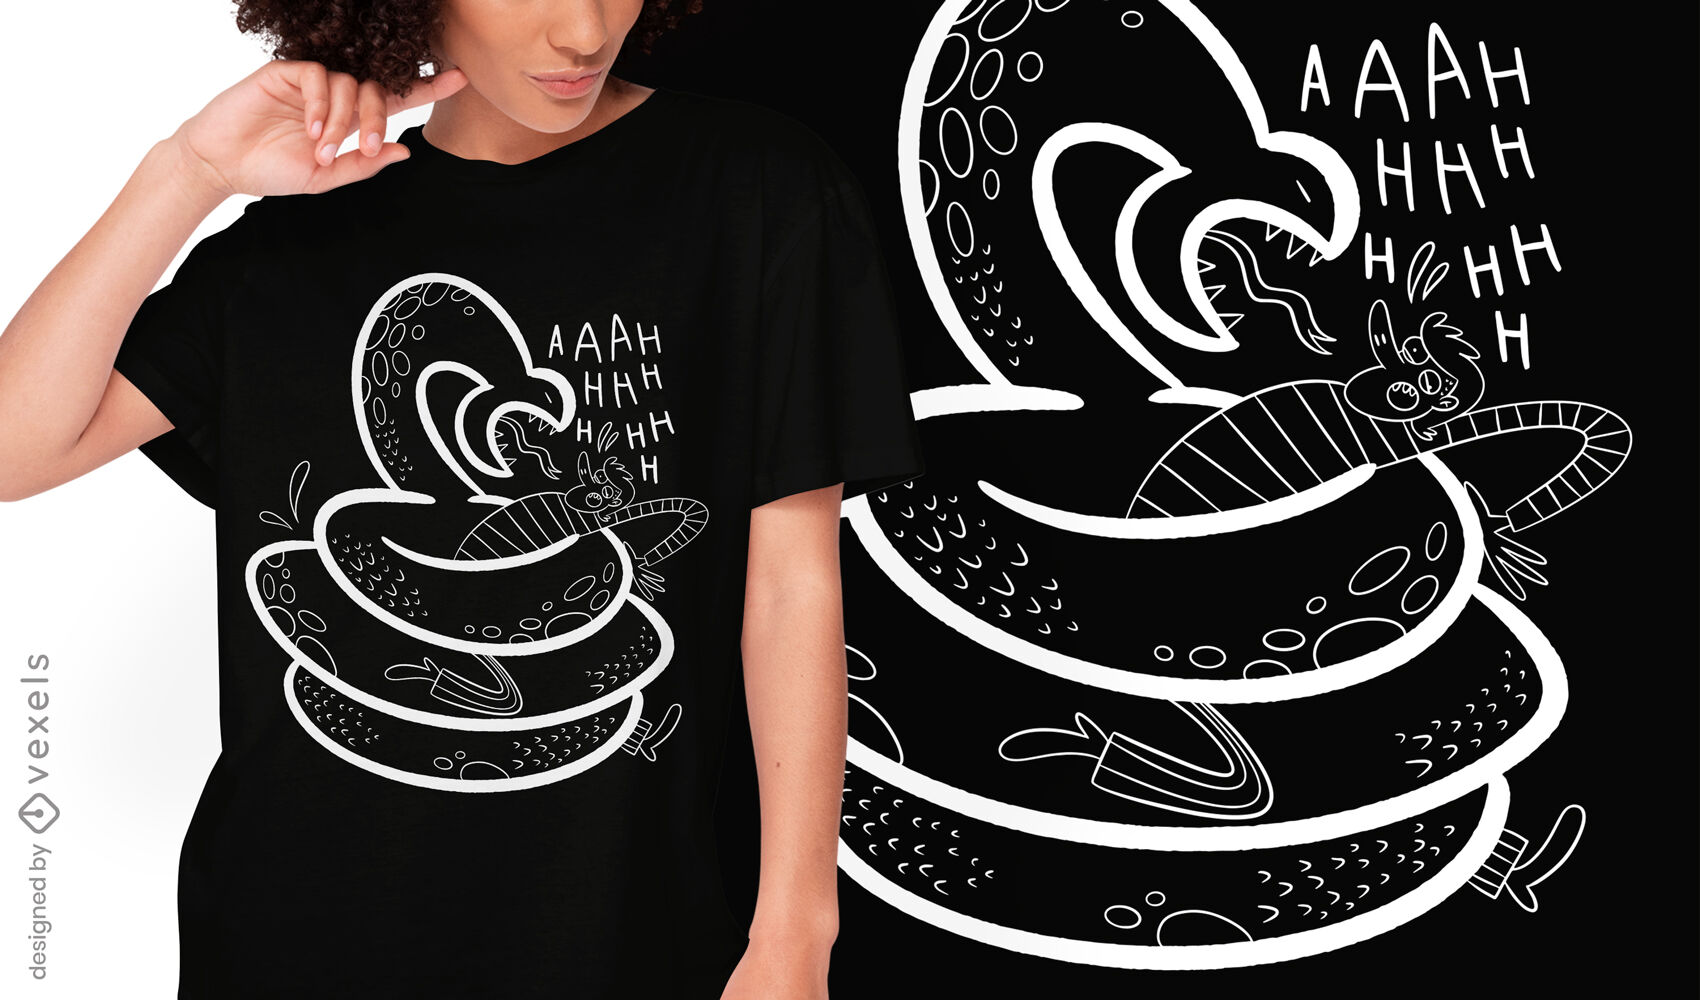 Fear of snakes doodle t-shirt design